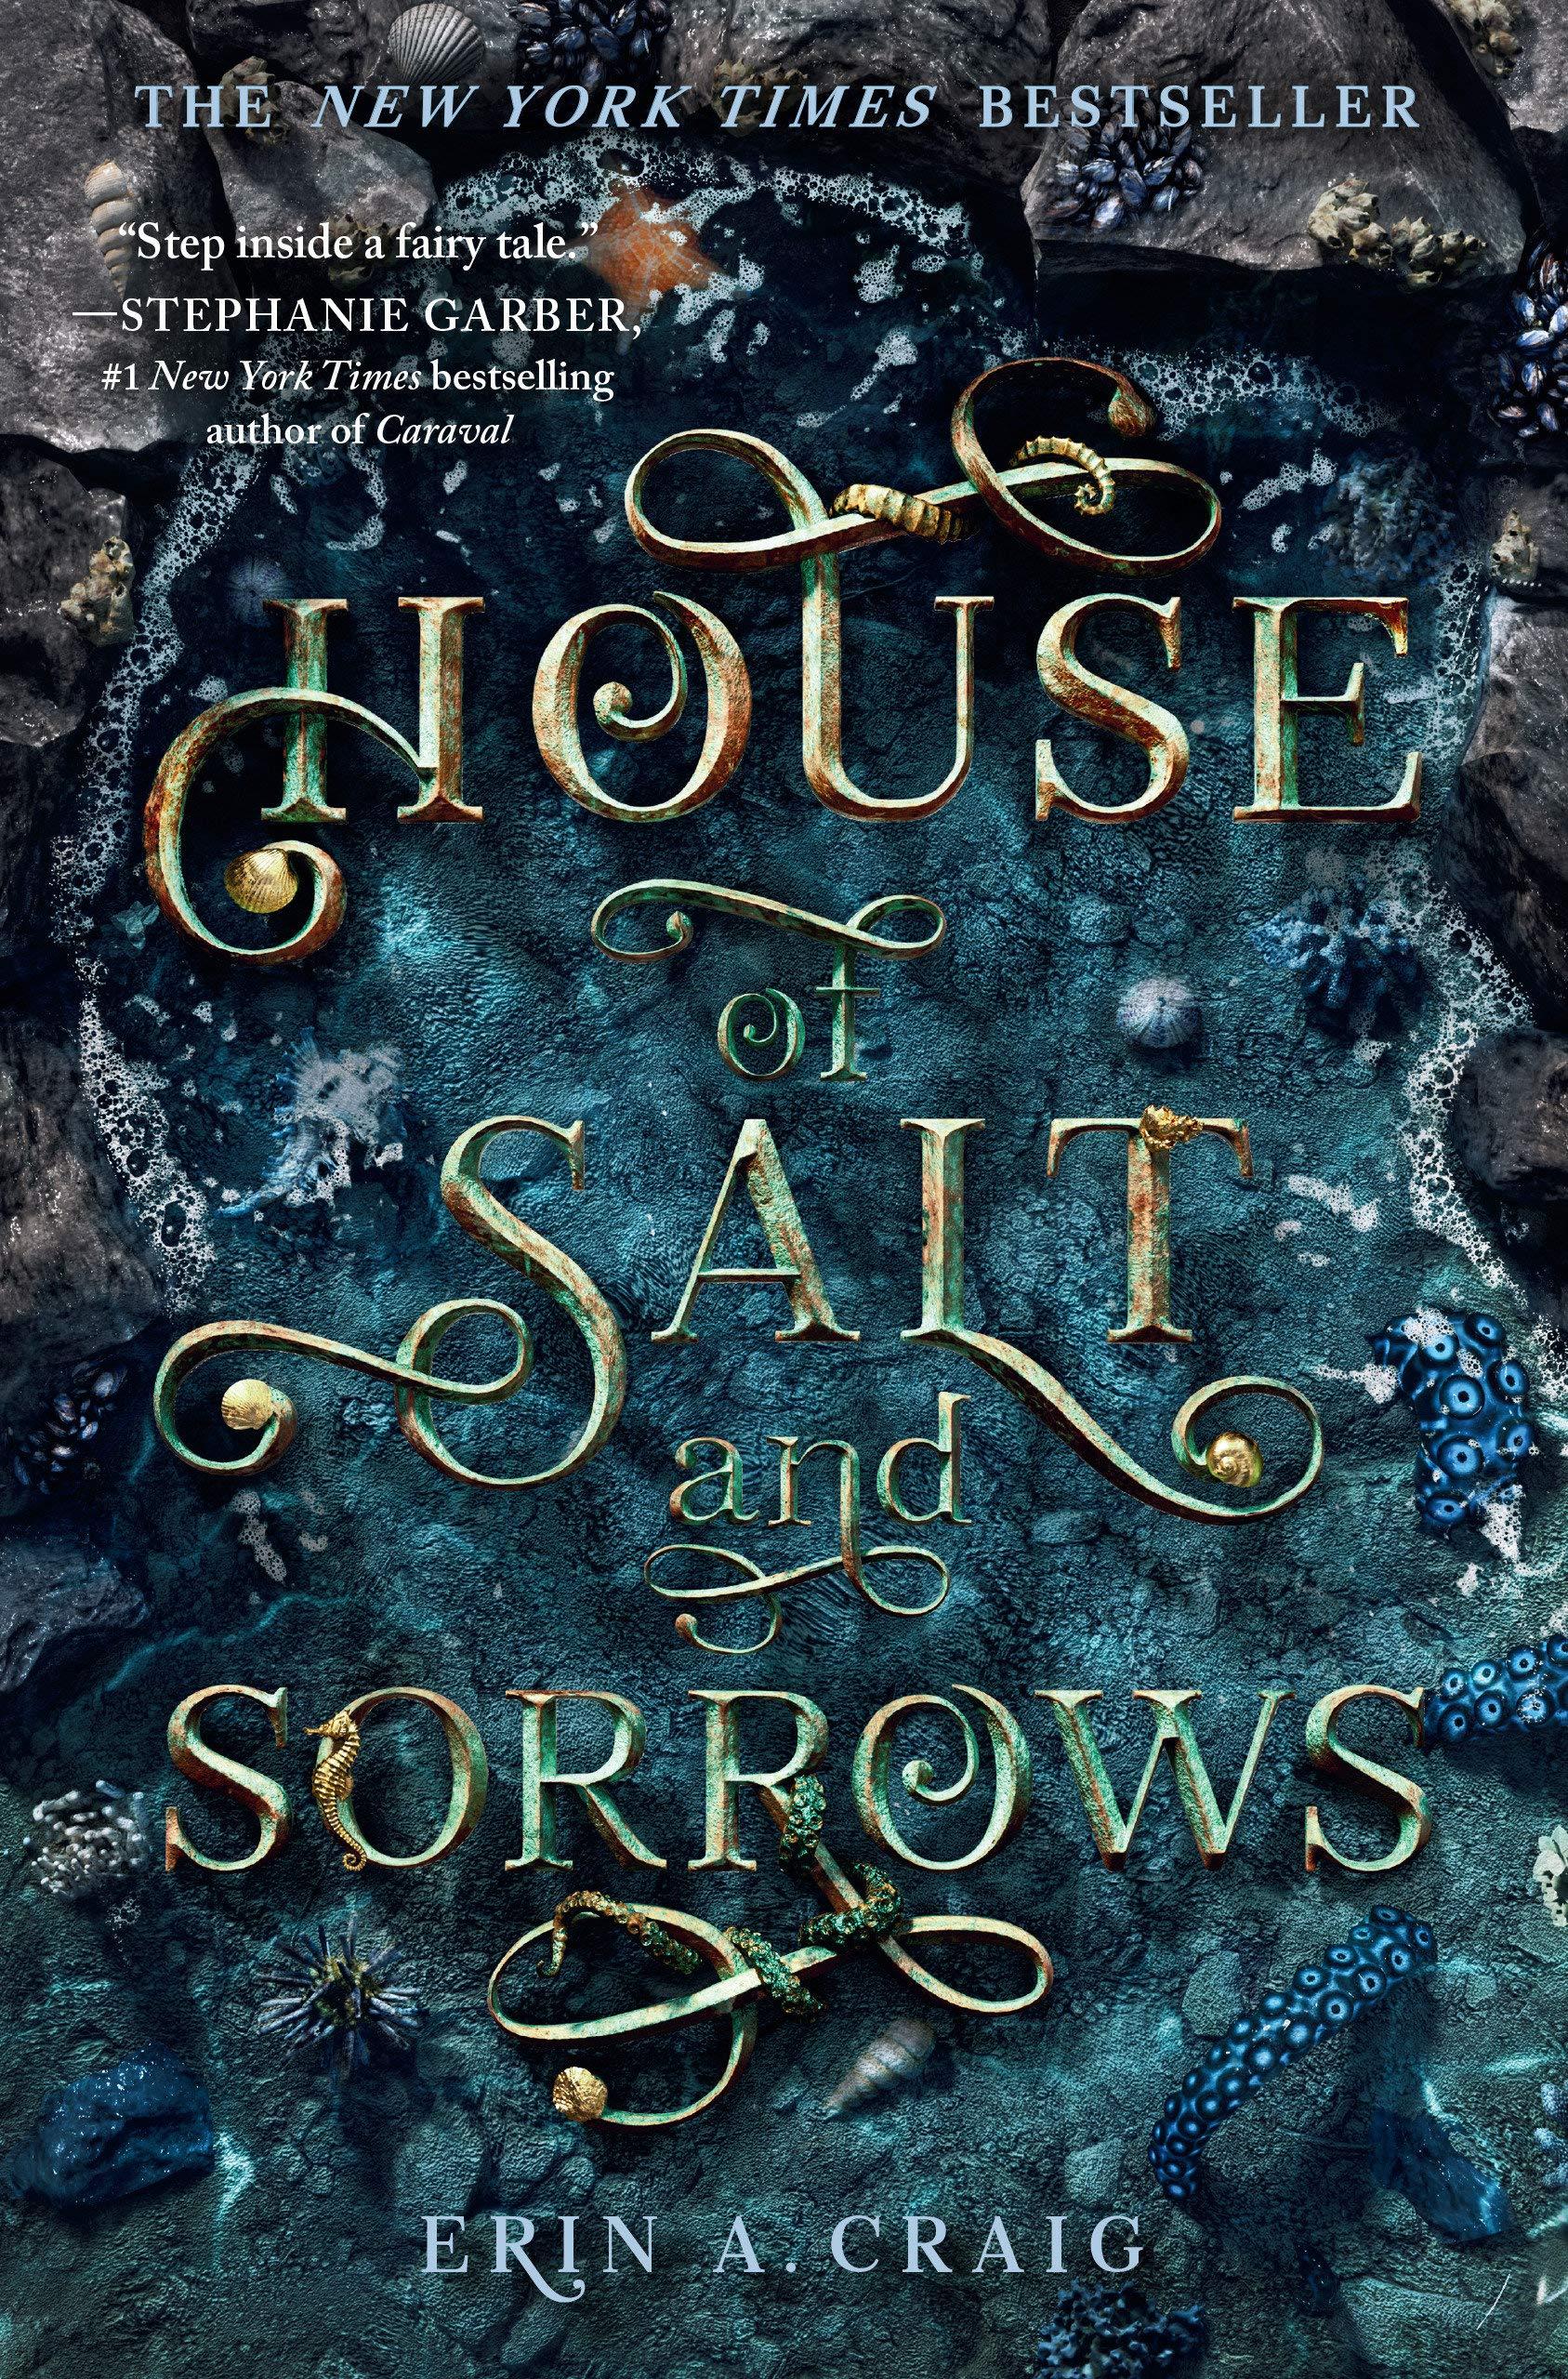 Amazon.com: House of Salt and Sorrows: 9781984831927: Craig, Erin A.: Books